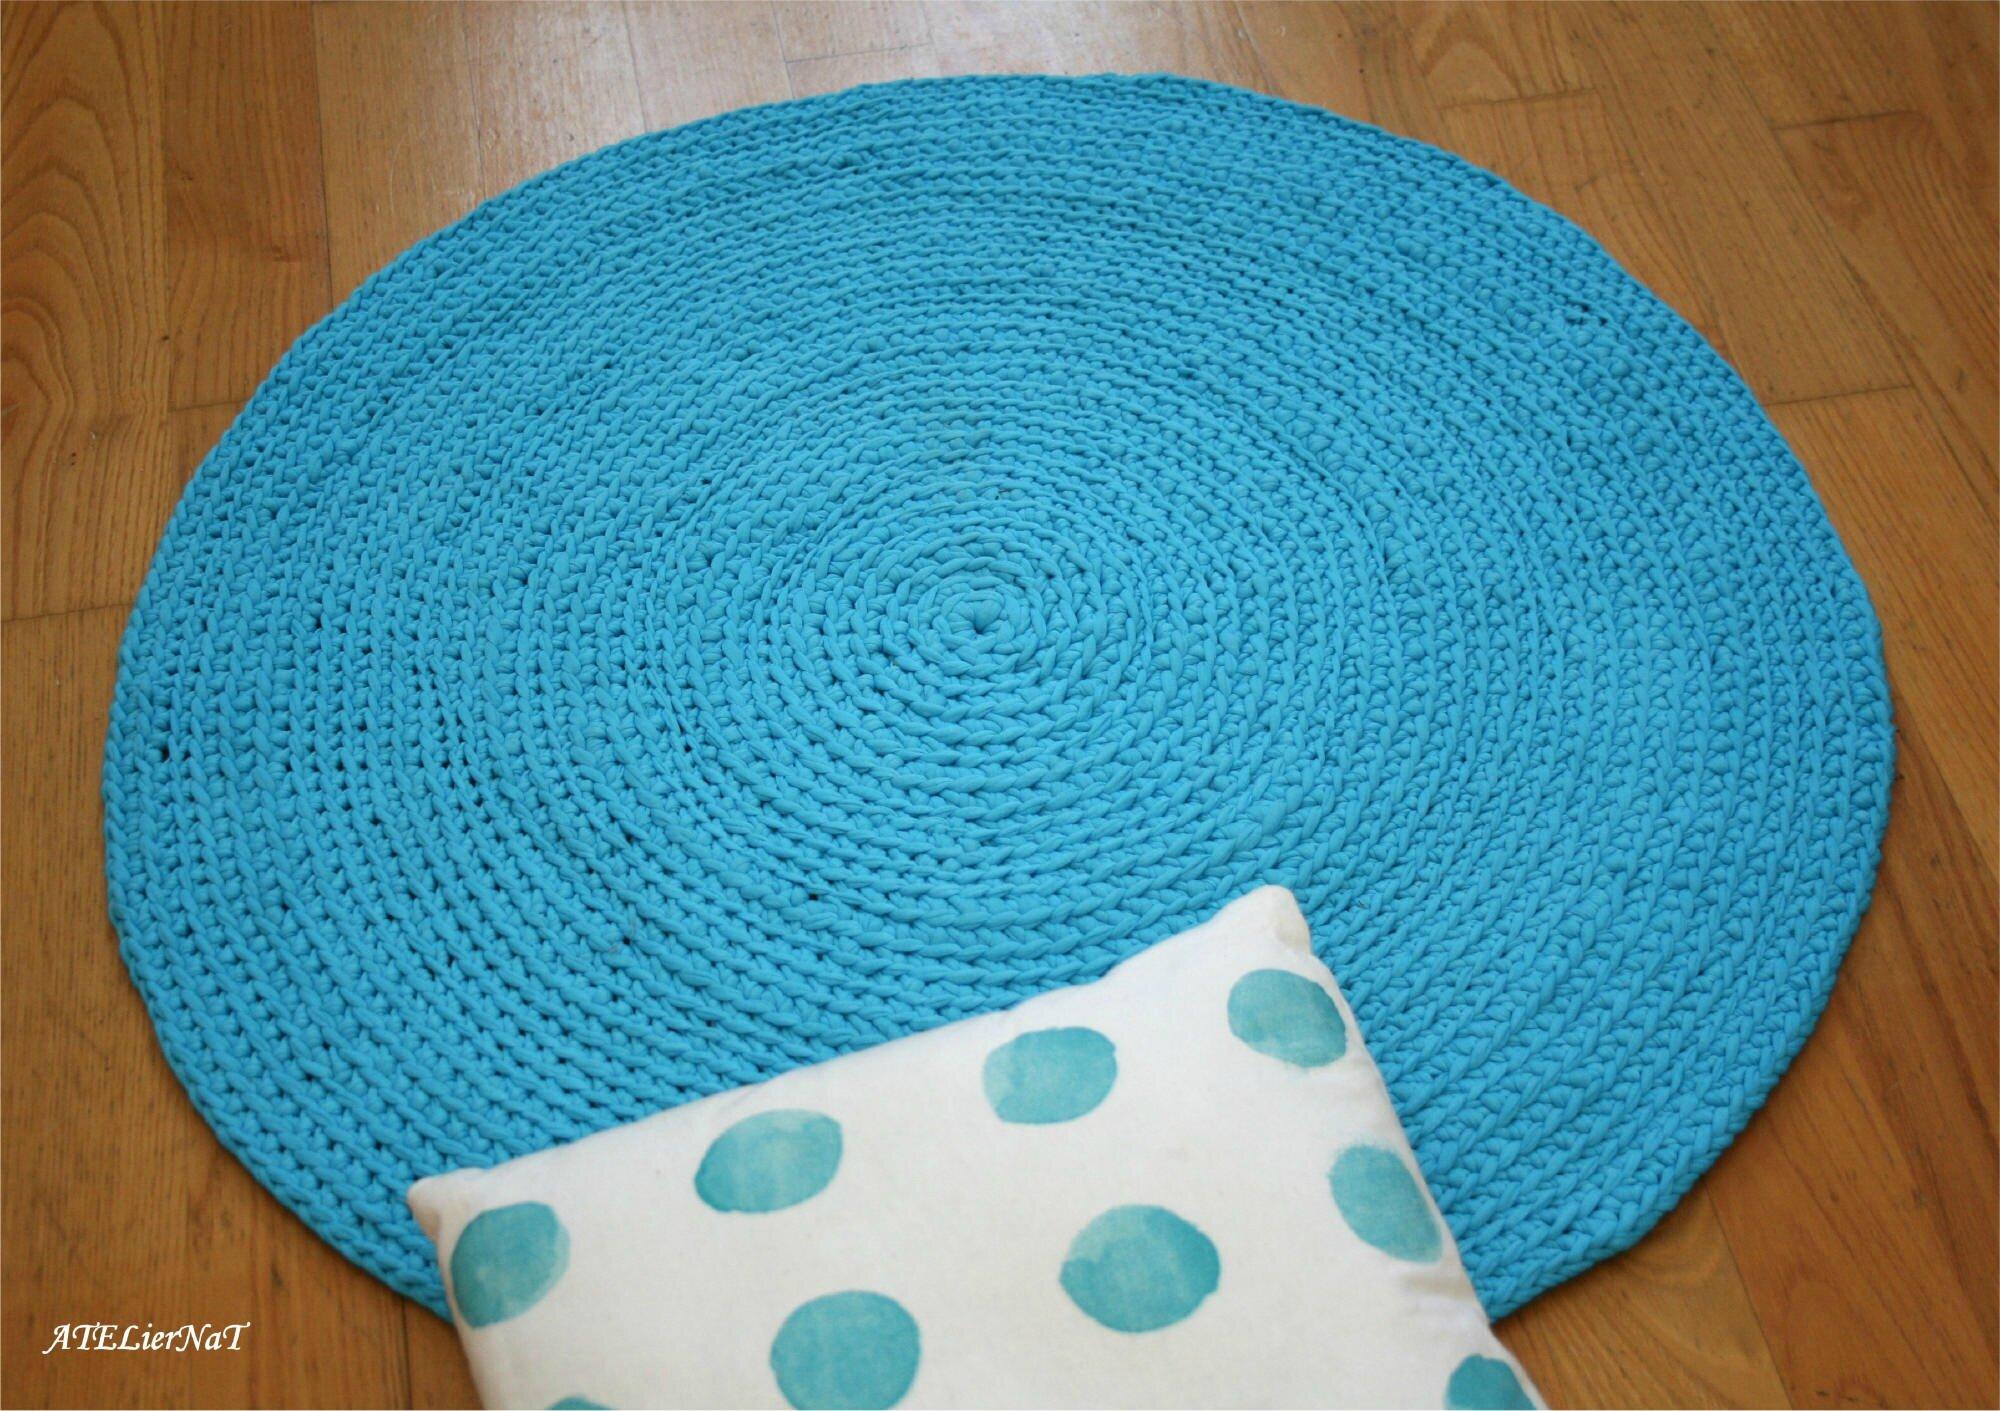 tapis rond au crochet ateliernat cr ations d co loisirs cr atifs. Black Bedroom Furniture Sets. Home Design Ideas